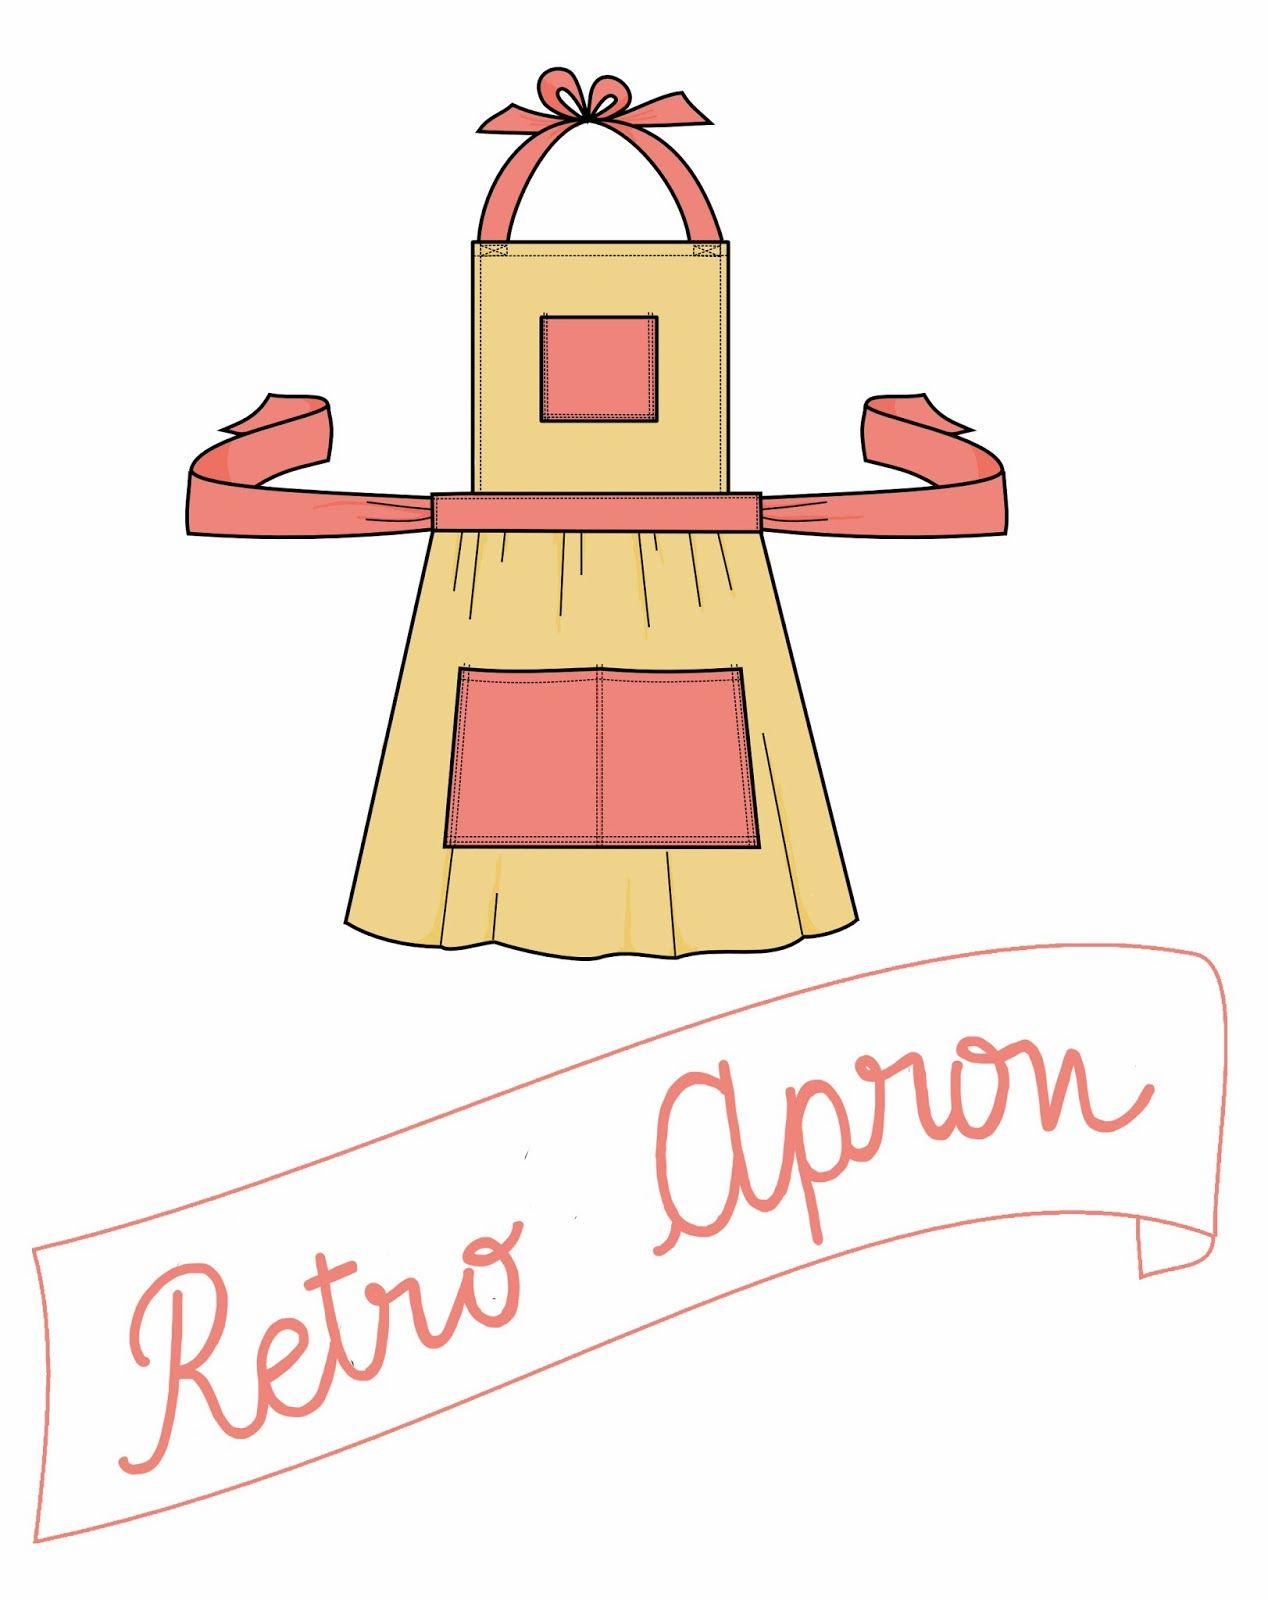 Retro Apron Tutorial |pauline alice - Sewing patterns, tutorials ...